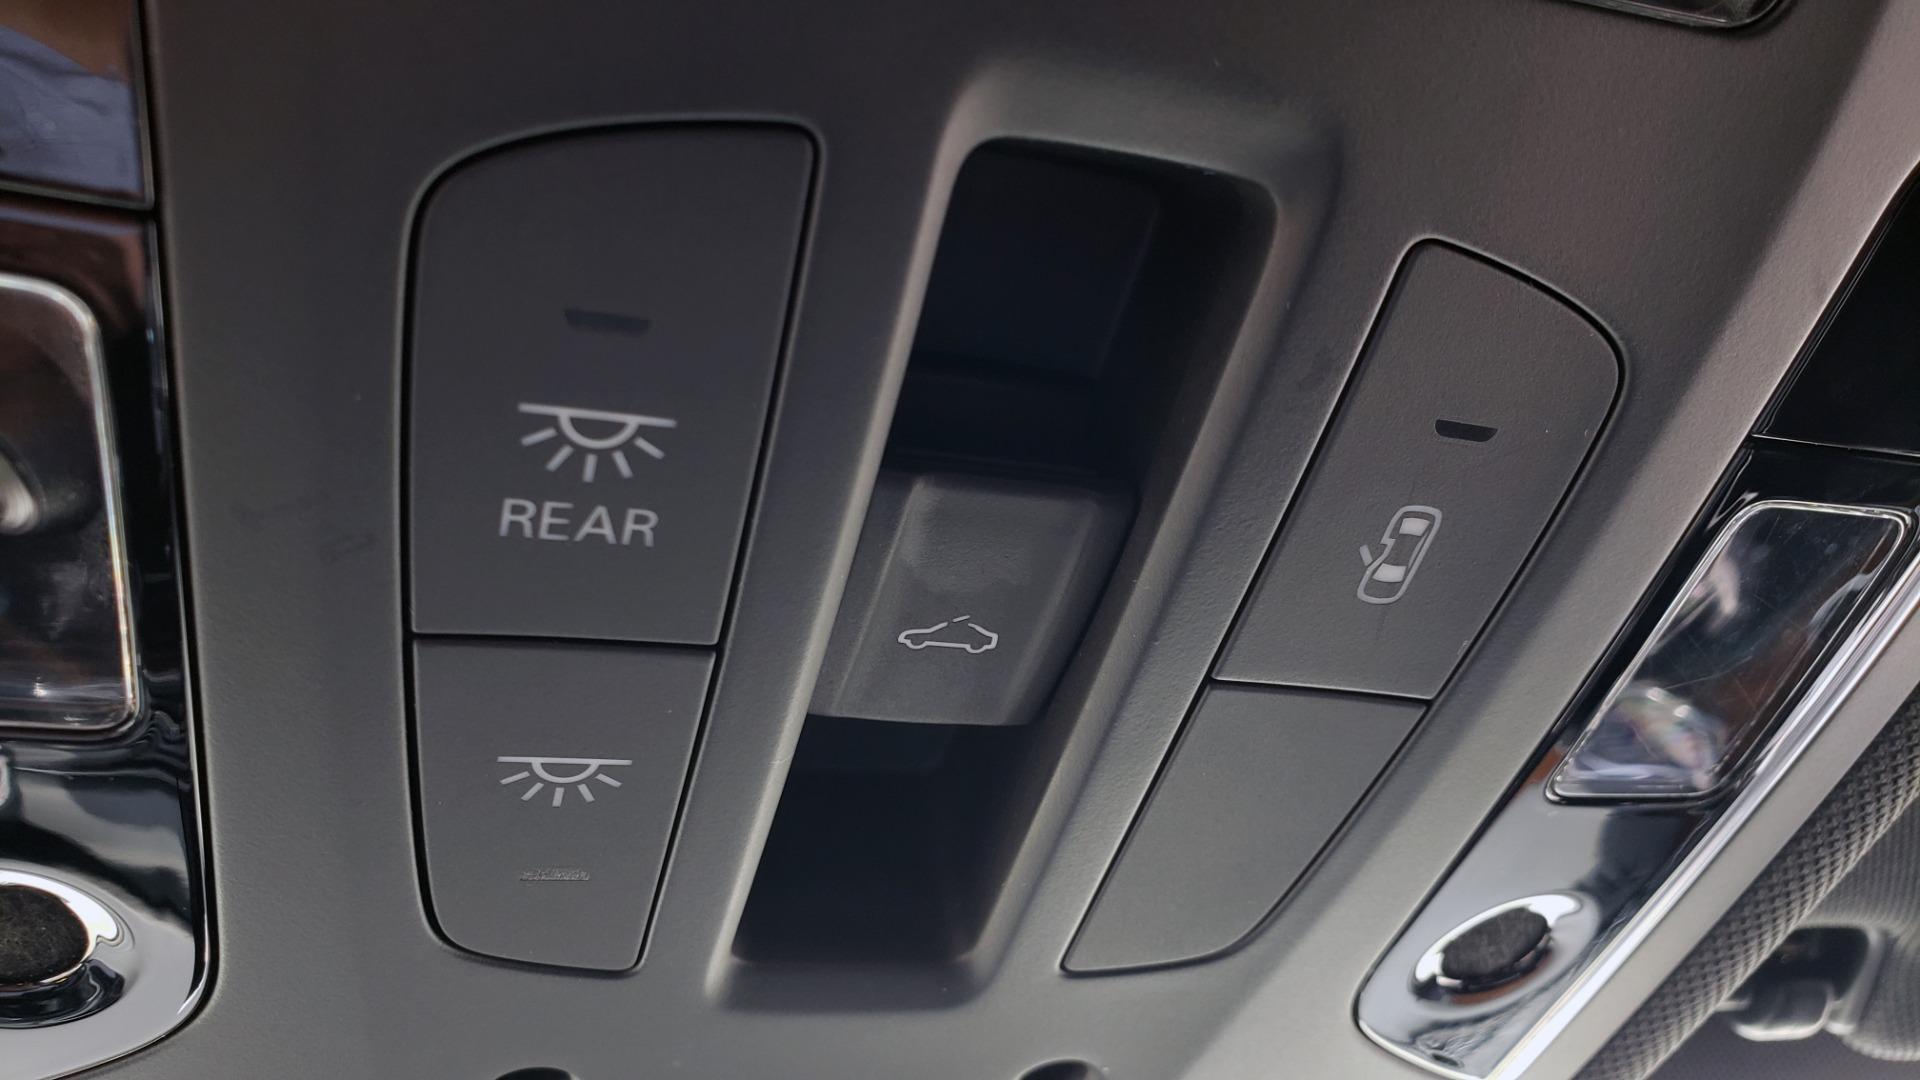 Used 2017 Audi A6 PRESTIGE SEDAN 3.0T / NAV / SUNROOF / BLACK OPTIC / CLD WTHR / REARVIEW for sale $30,797 at Formula Imports in Charlotte NC 28227 59